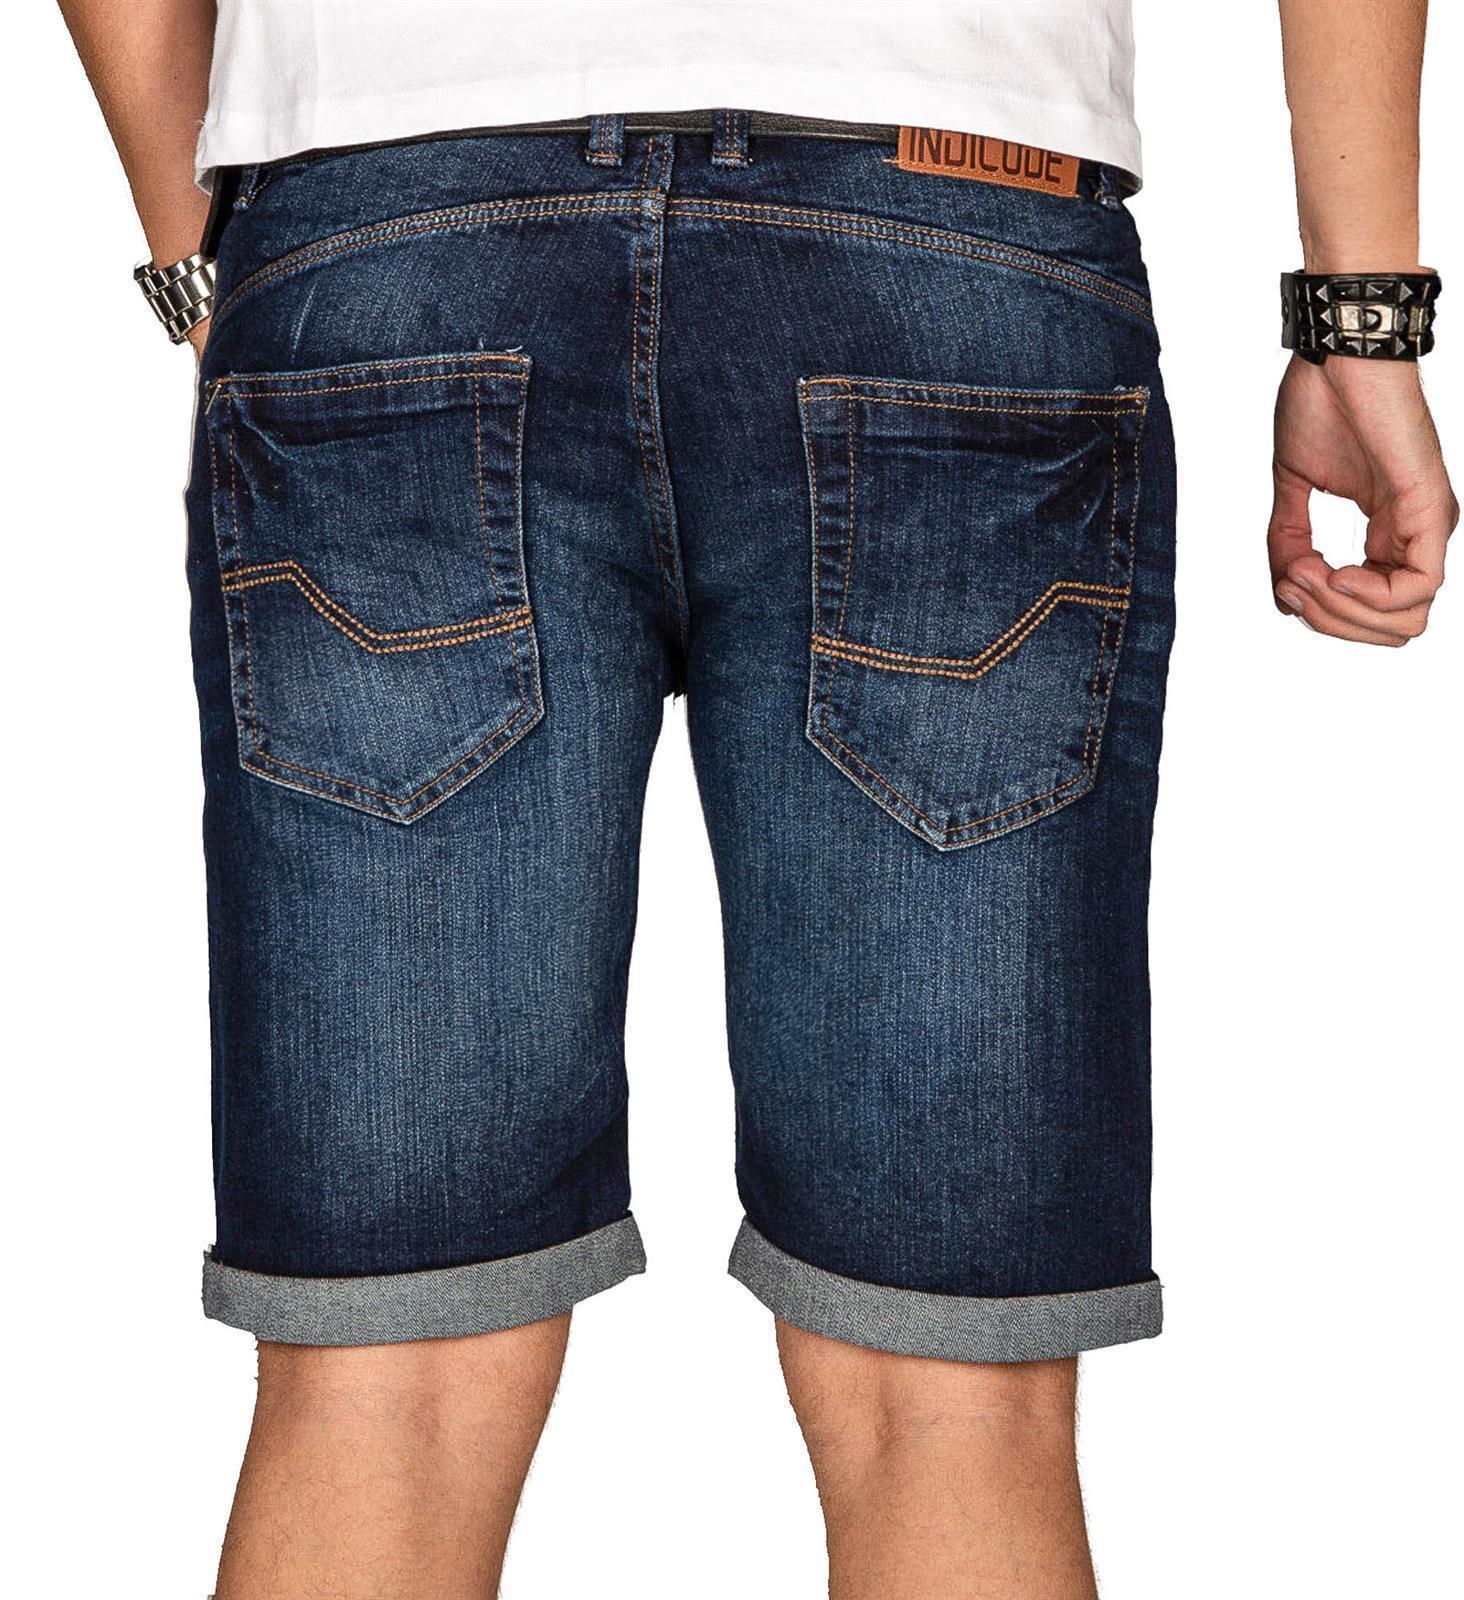 Indicode-Herren-Sommer-Bermuda-Jeans-Shorts-kurze-Hose-Sommerhose-Short-Neu-B556 Indexbild 35